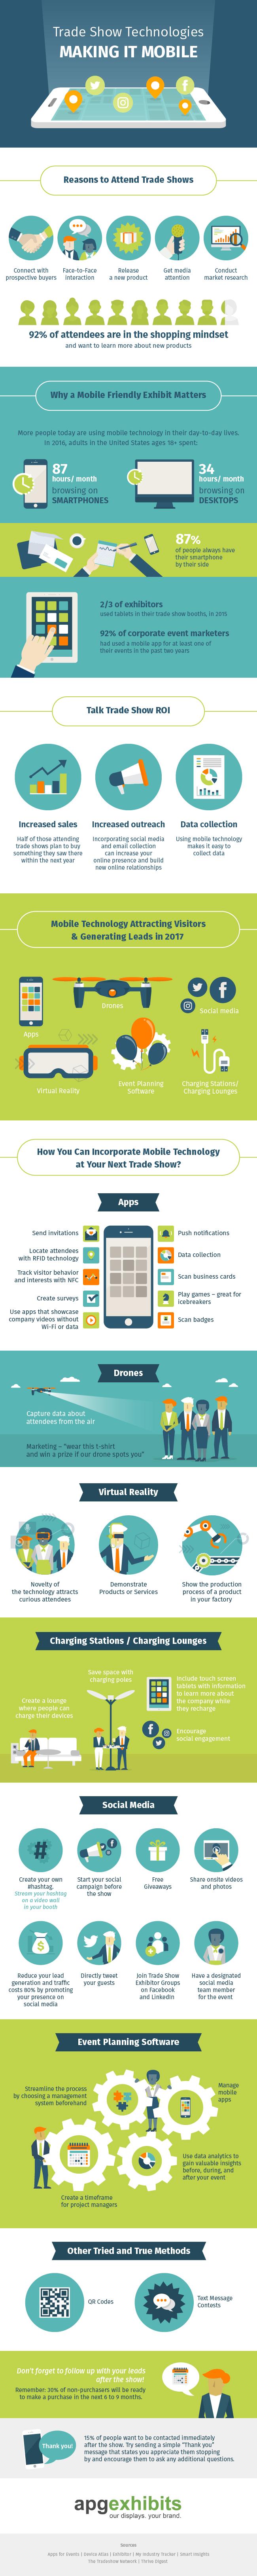 Trade-Shows-Mobile